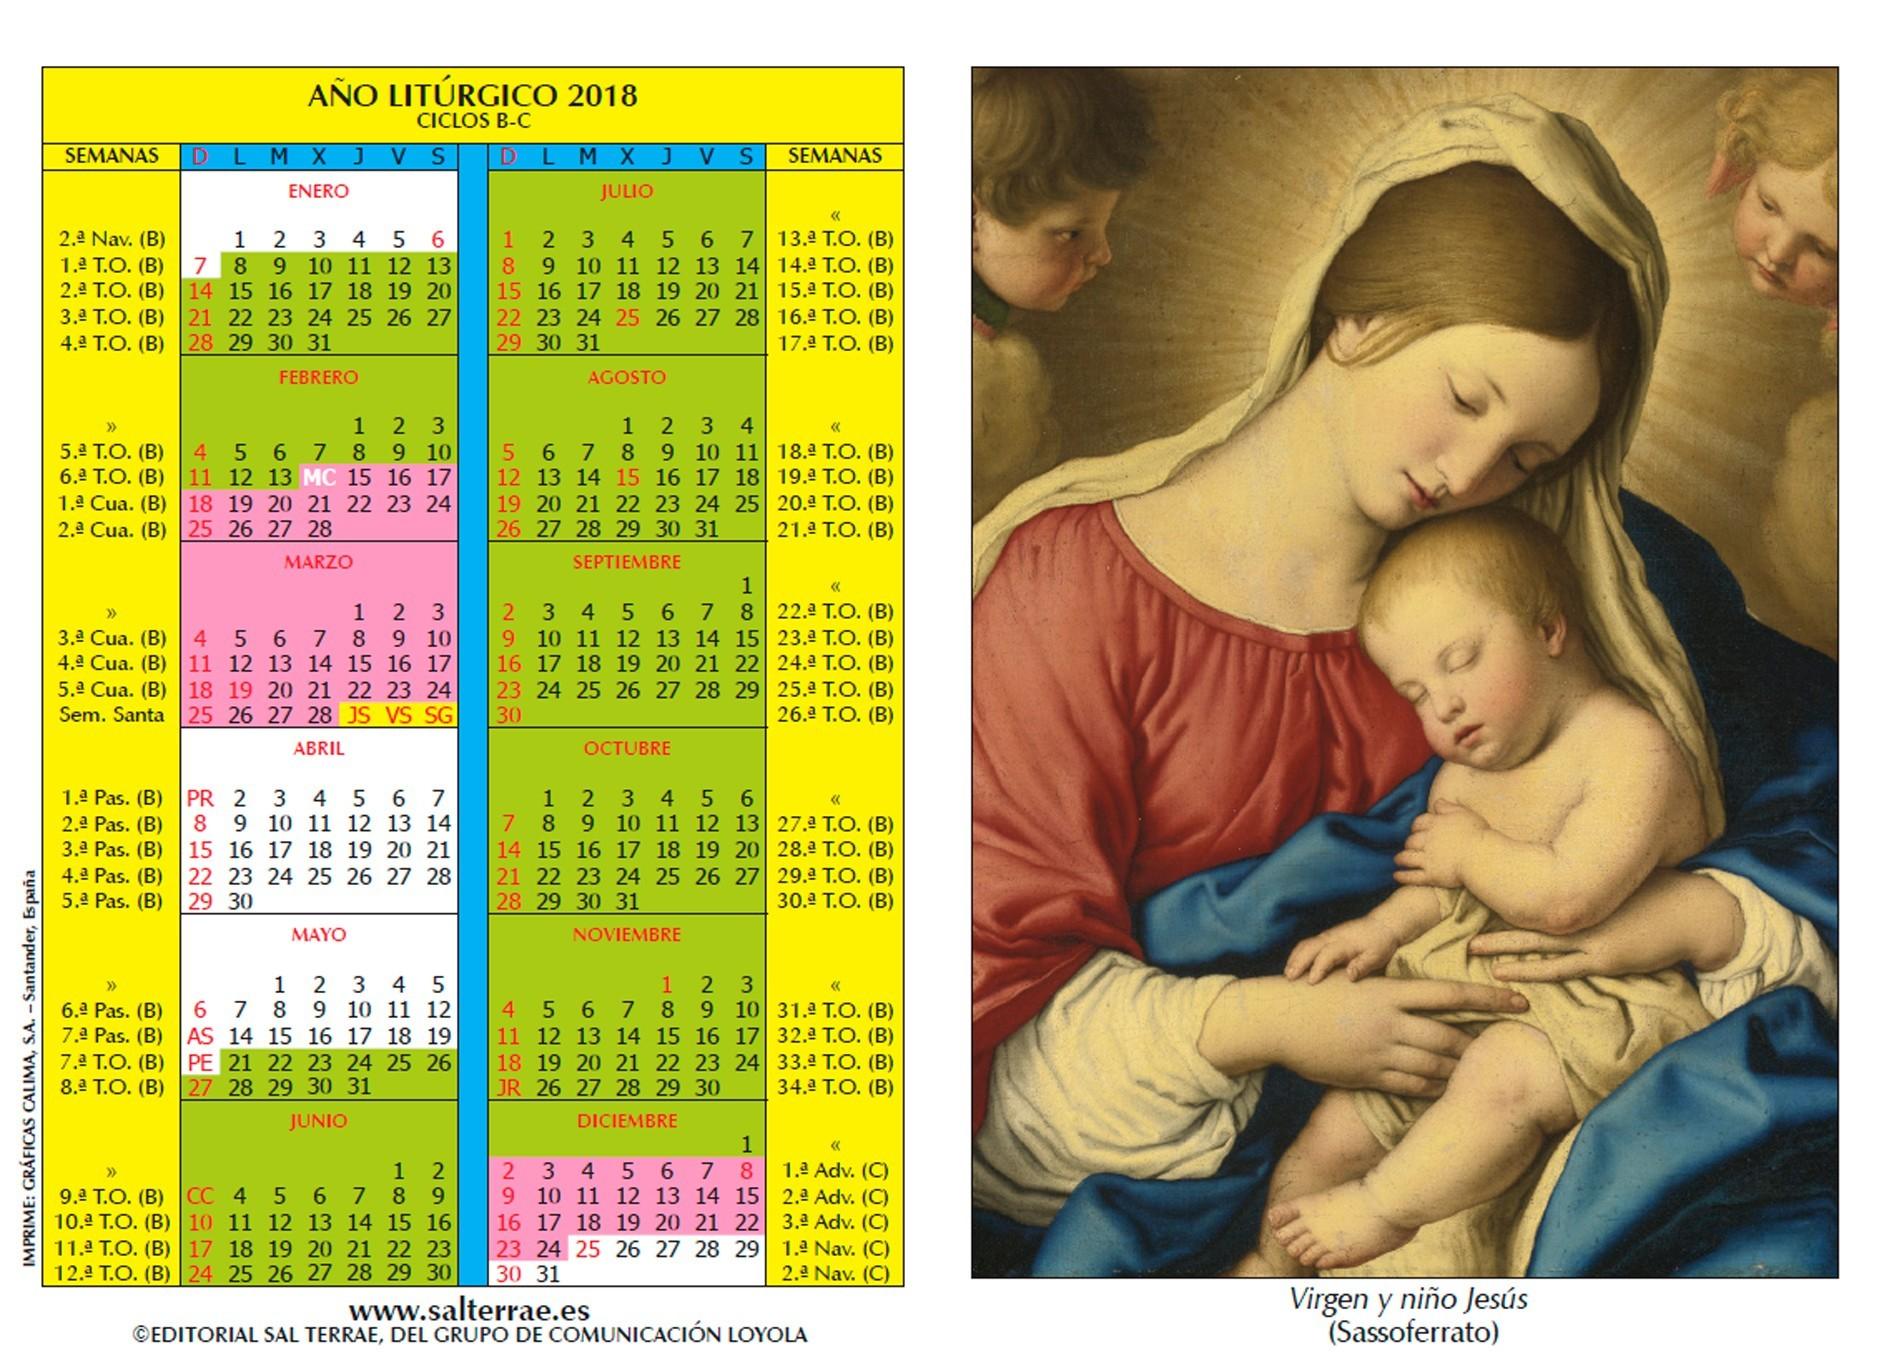 Calendarito del a±o Litºrgico 2018 Modelo Navidad Grupo de unicaci³n Loyola